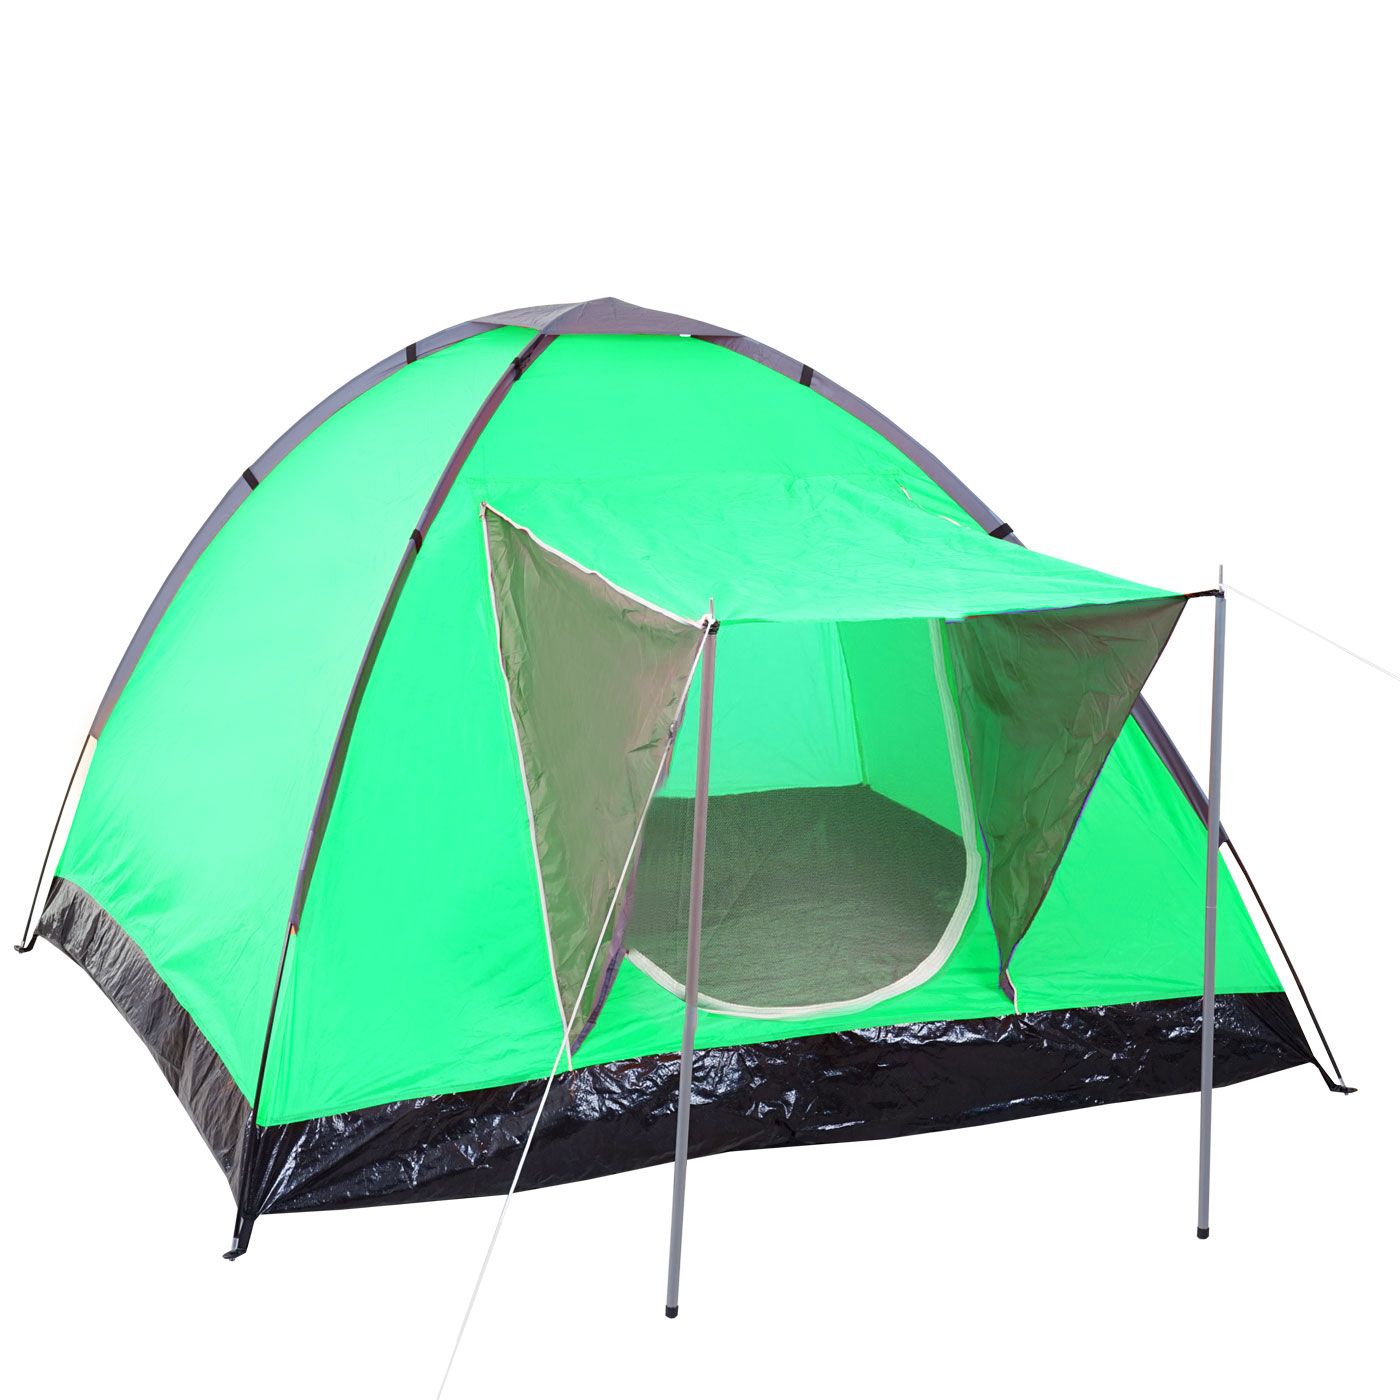 3 Man Zelt : Campingzelt loksa mann zelt kuppelzelt igluzelt